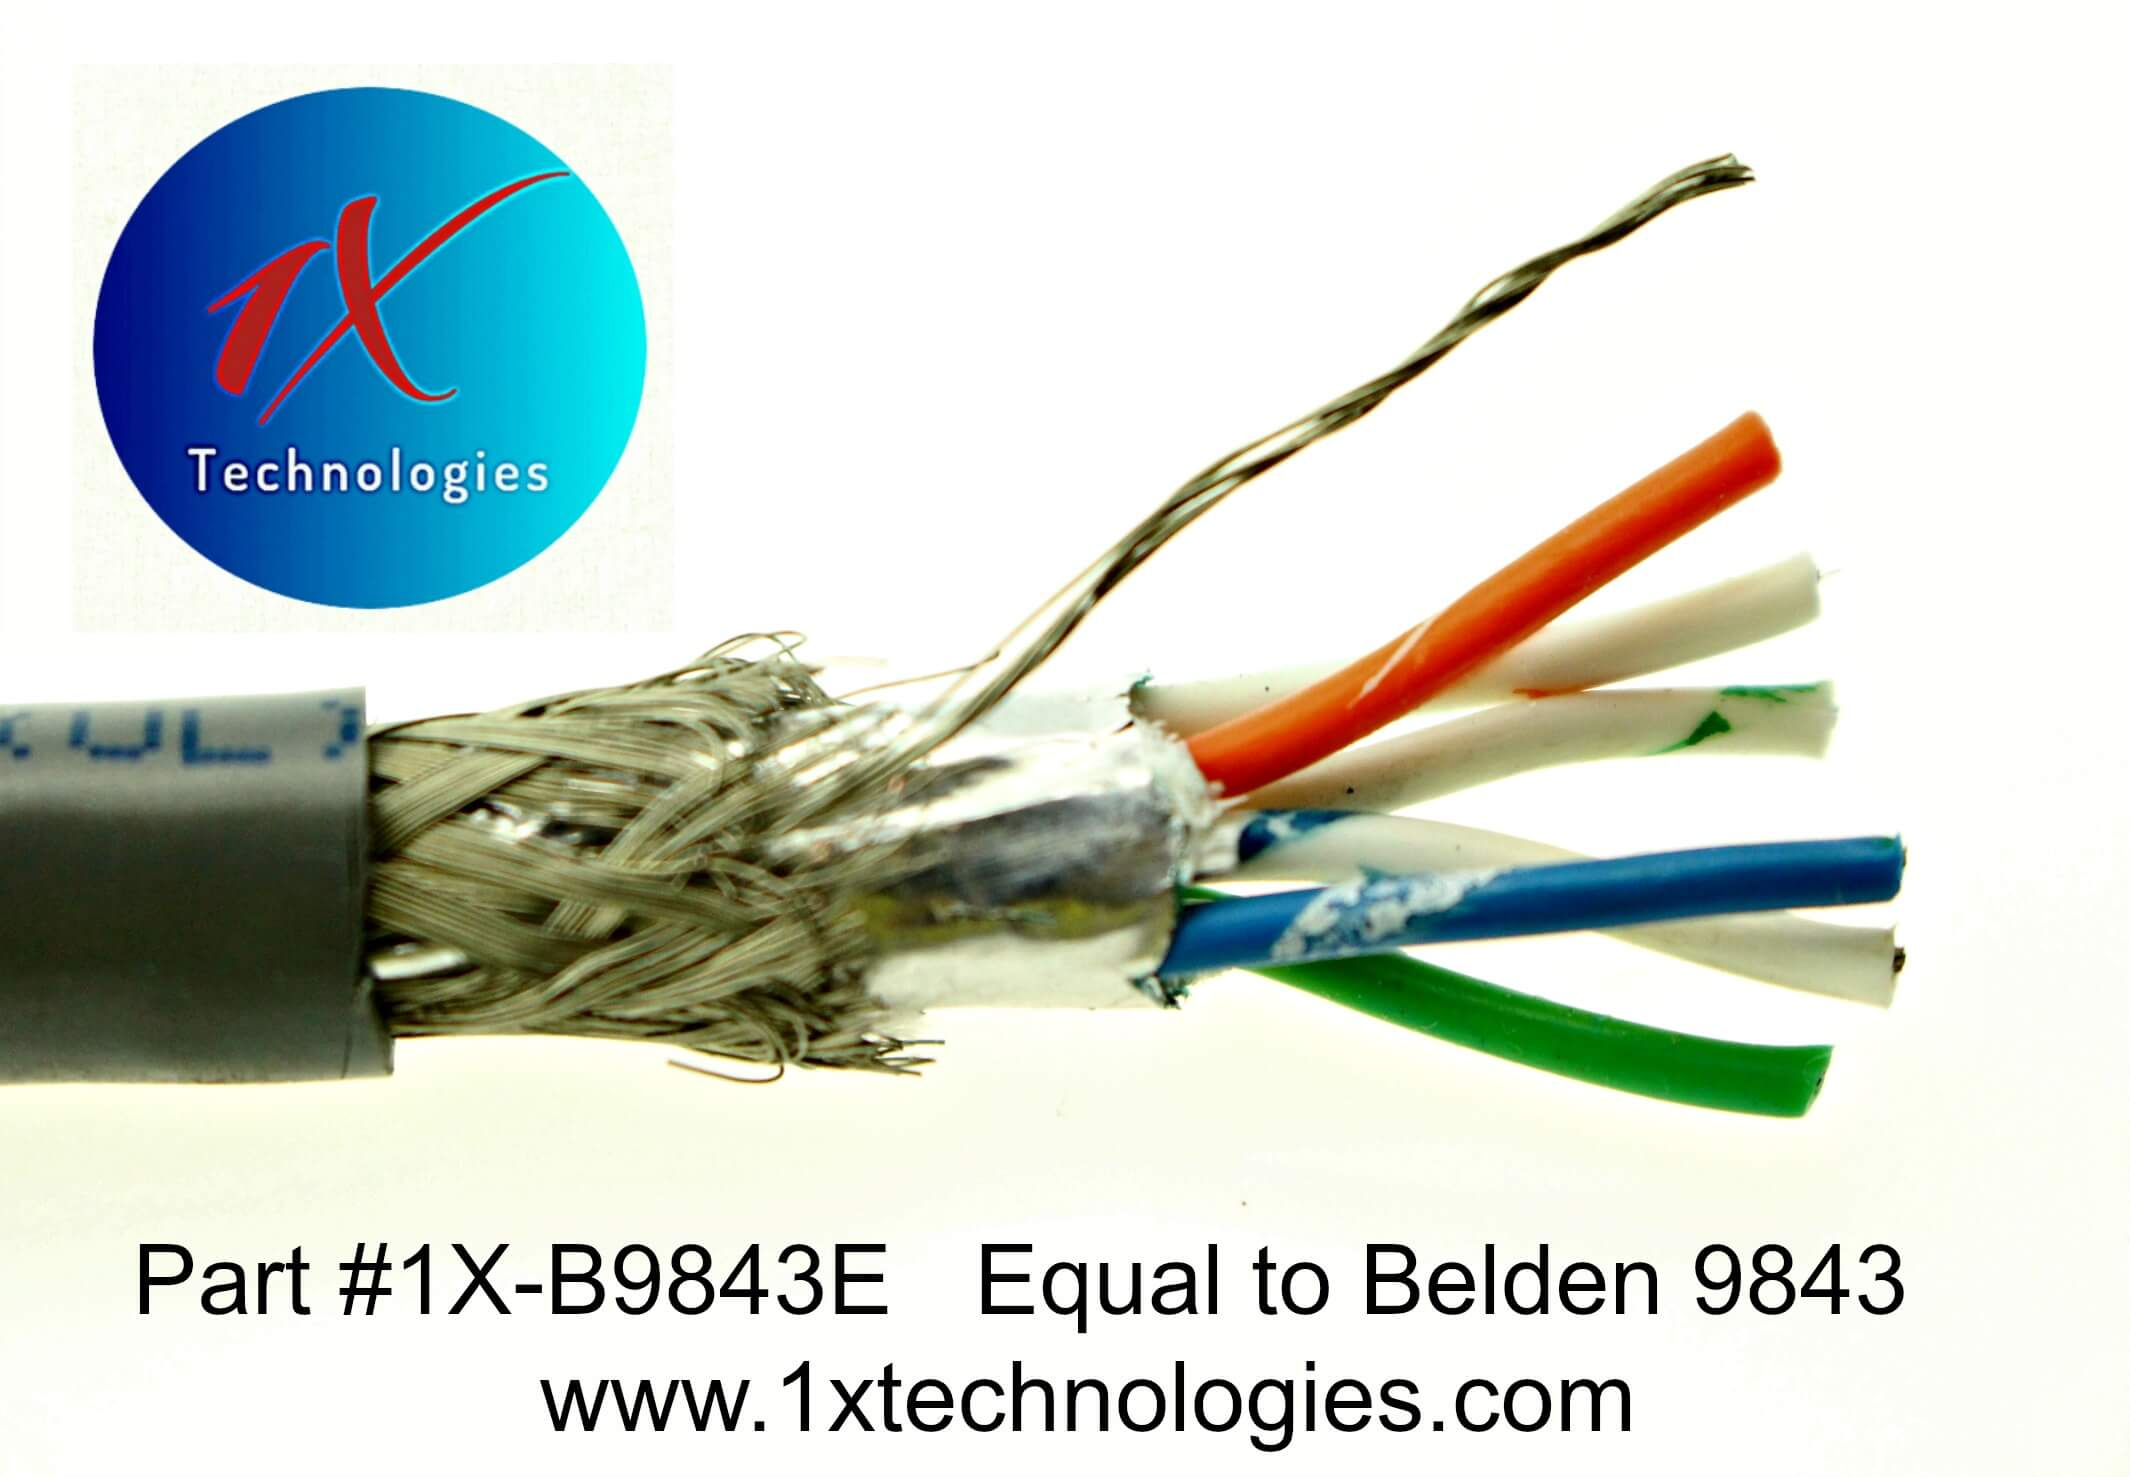 Belden 9843 Equal, Equivalent, Alternative, Similar, B9843, Belden 9843 Cross Reference, Belden 9843 Supplier, Buy Belden 9843